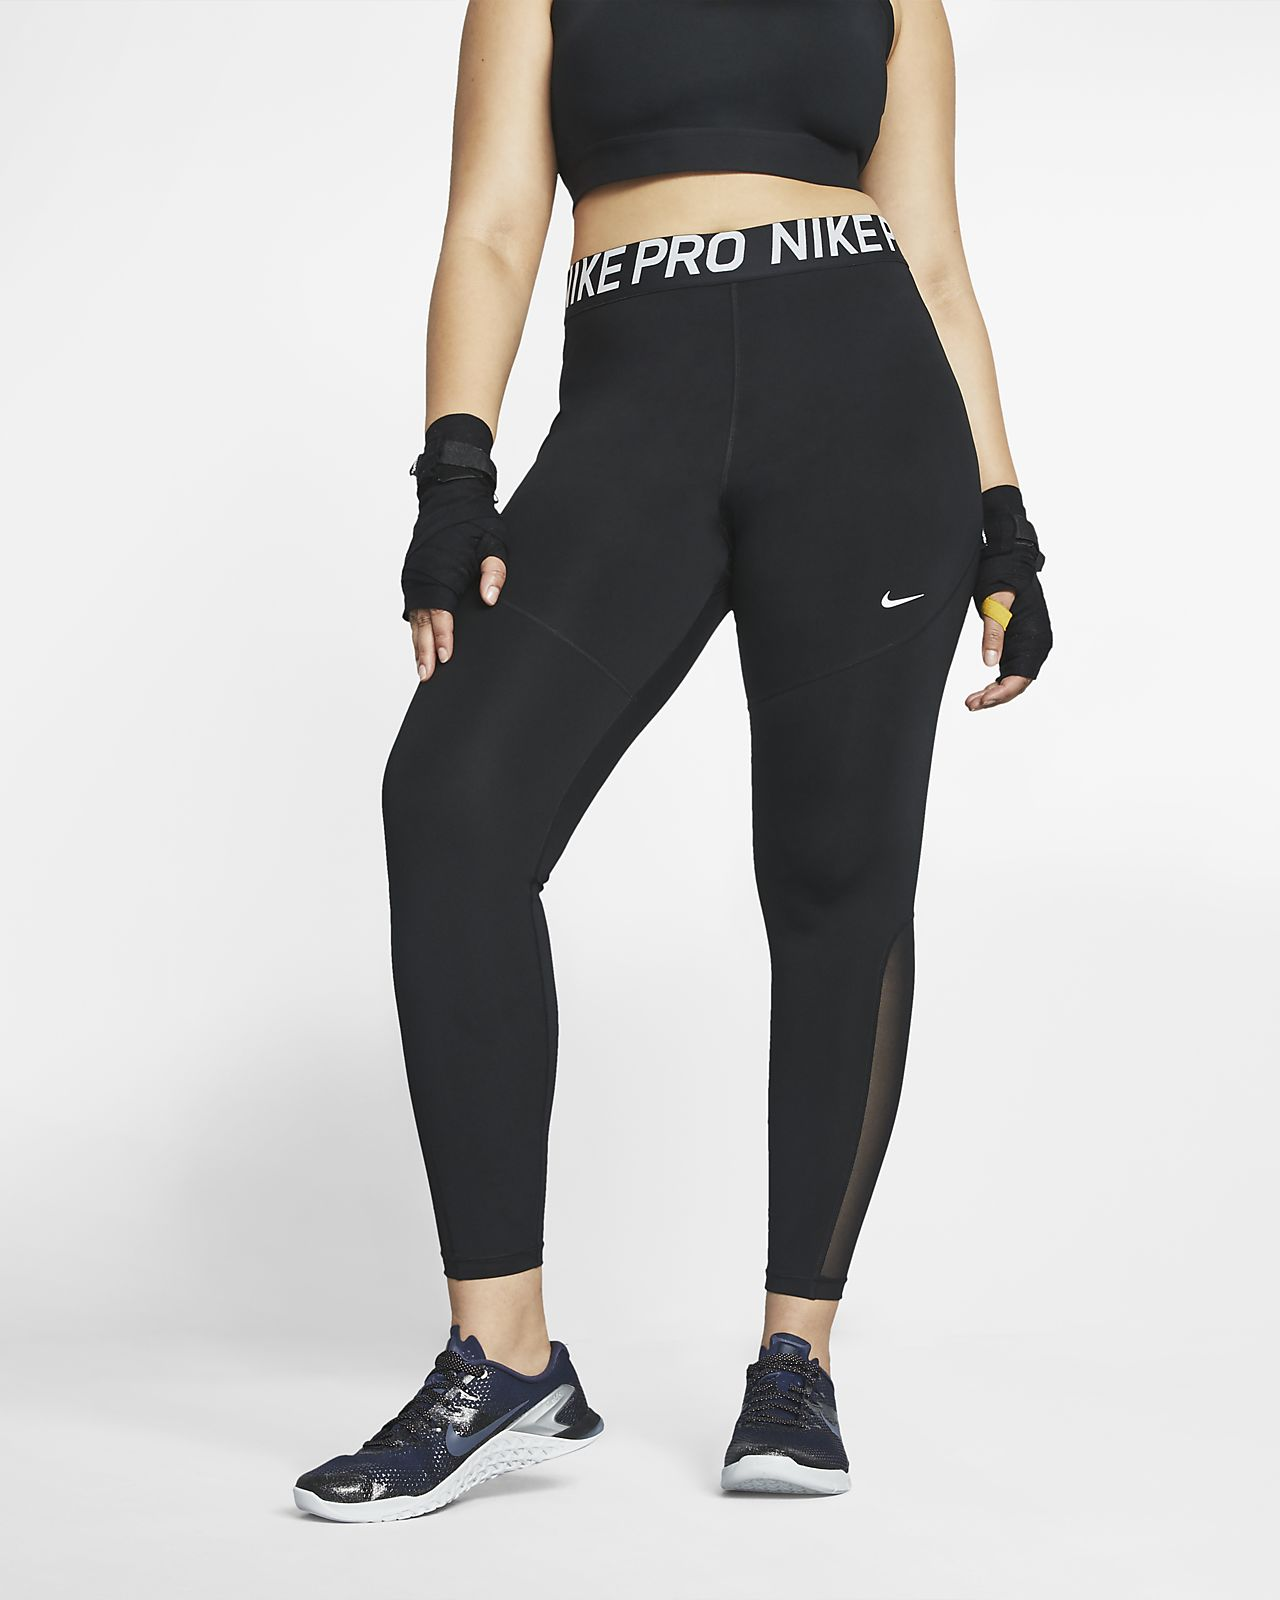 39b9af64bb93 Γυναικείο κολάν Nike Pro (μεγάλα μεγέθη). Nike.com GR